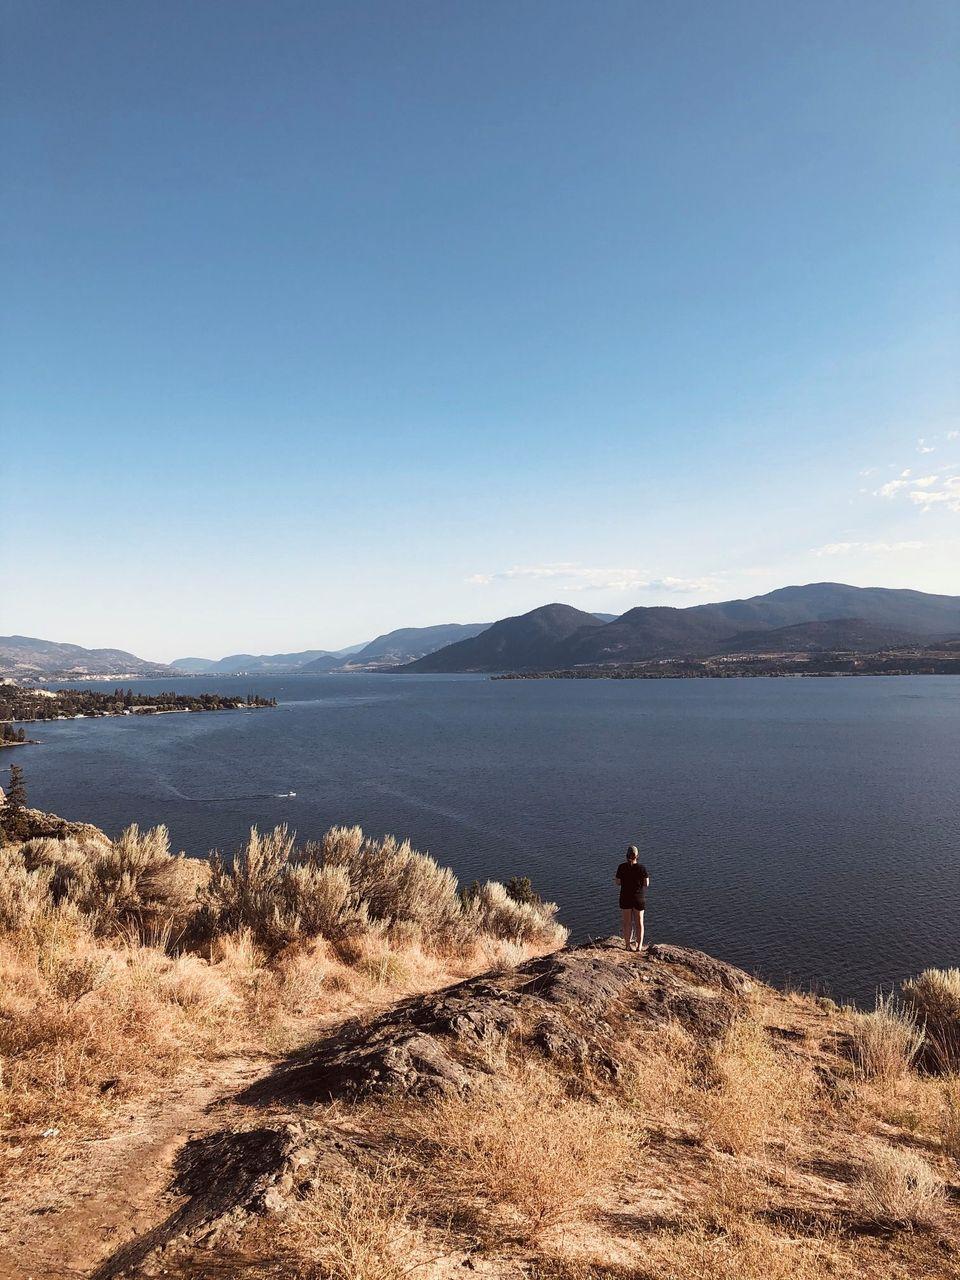 Visiter la vallée de l'Okanagan en Colombie-Britannique lors d'un roadtrip